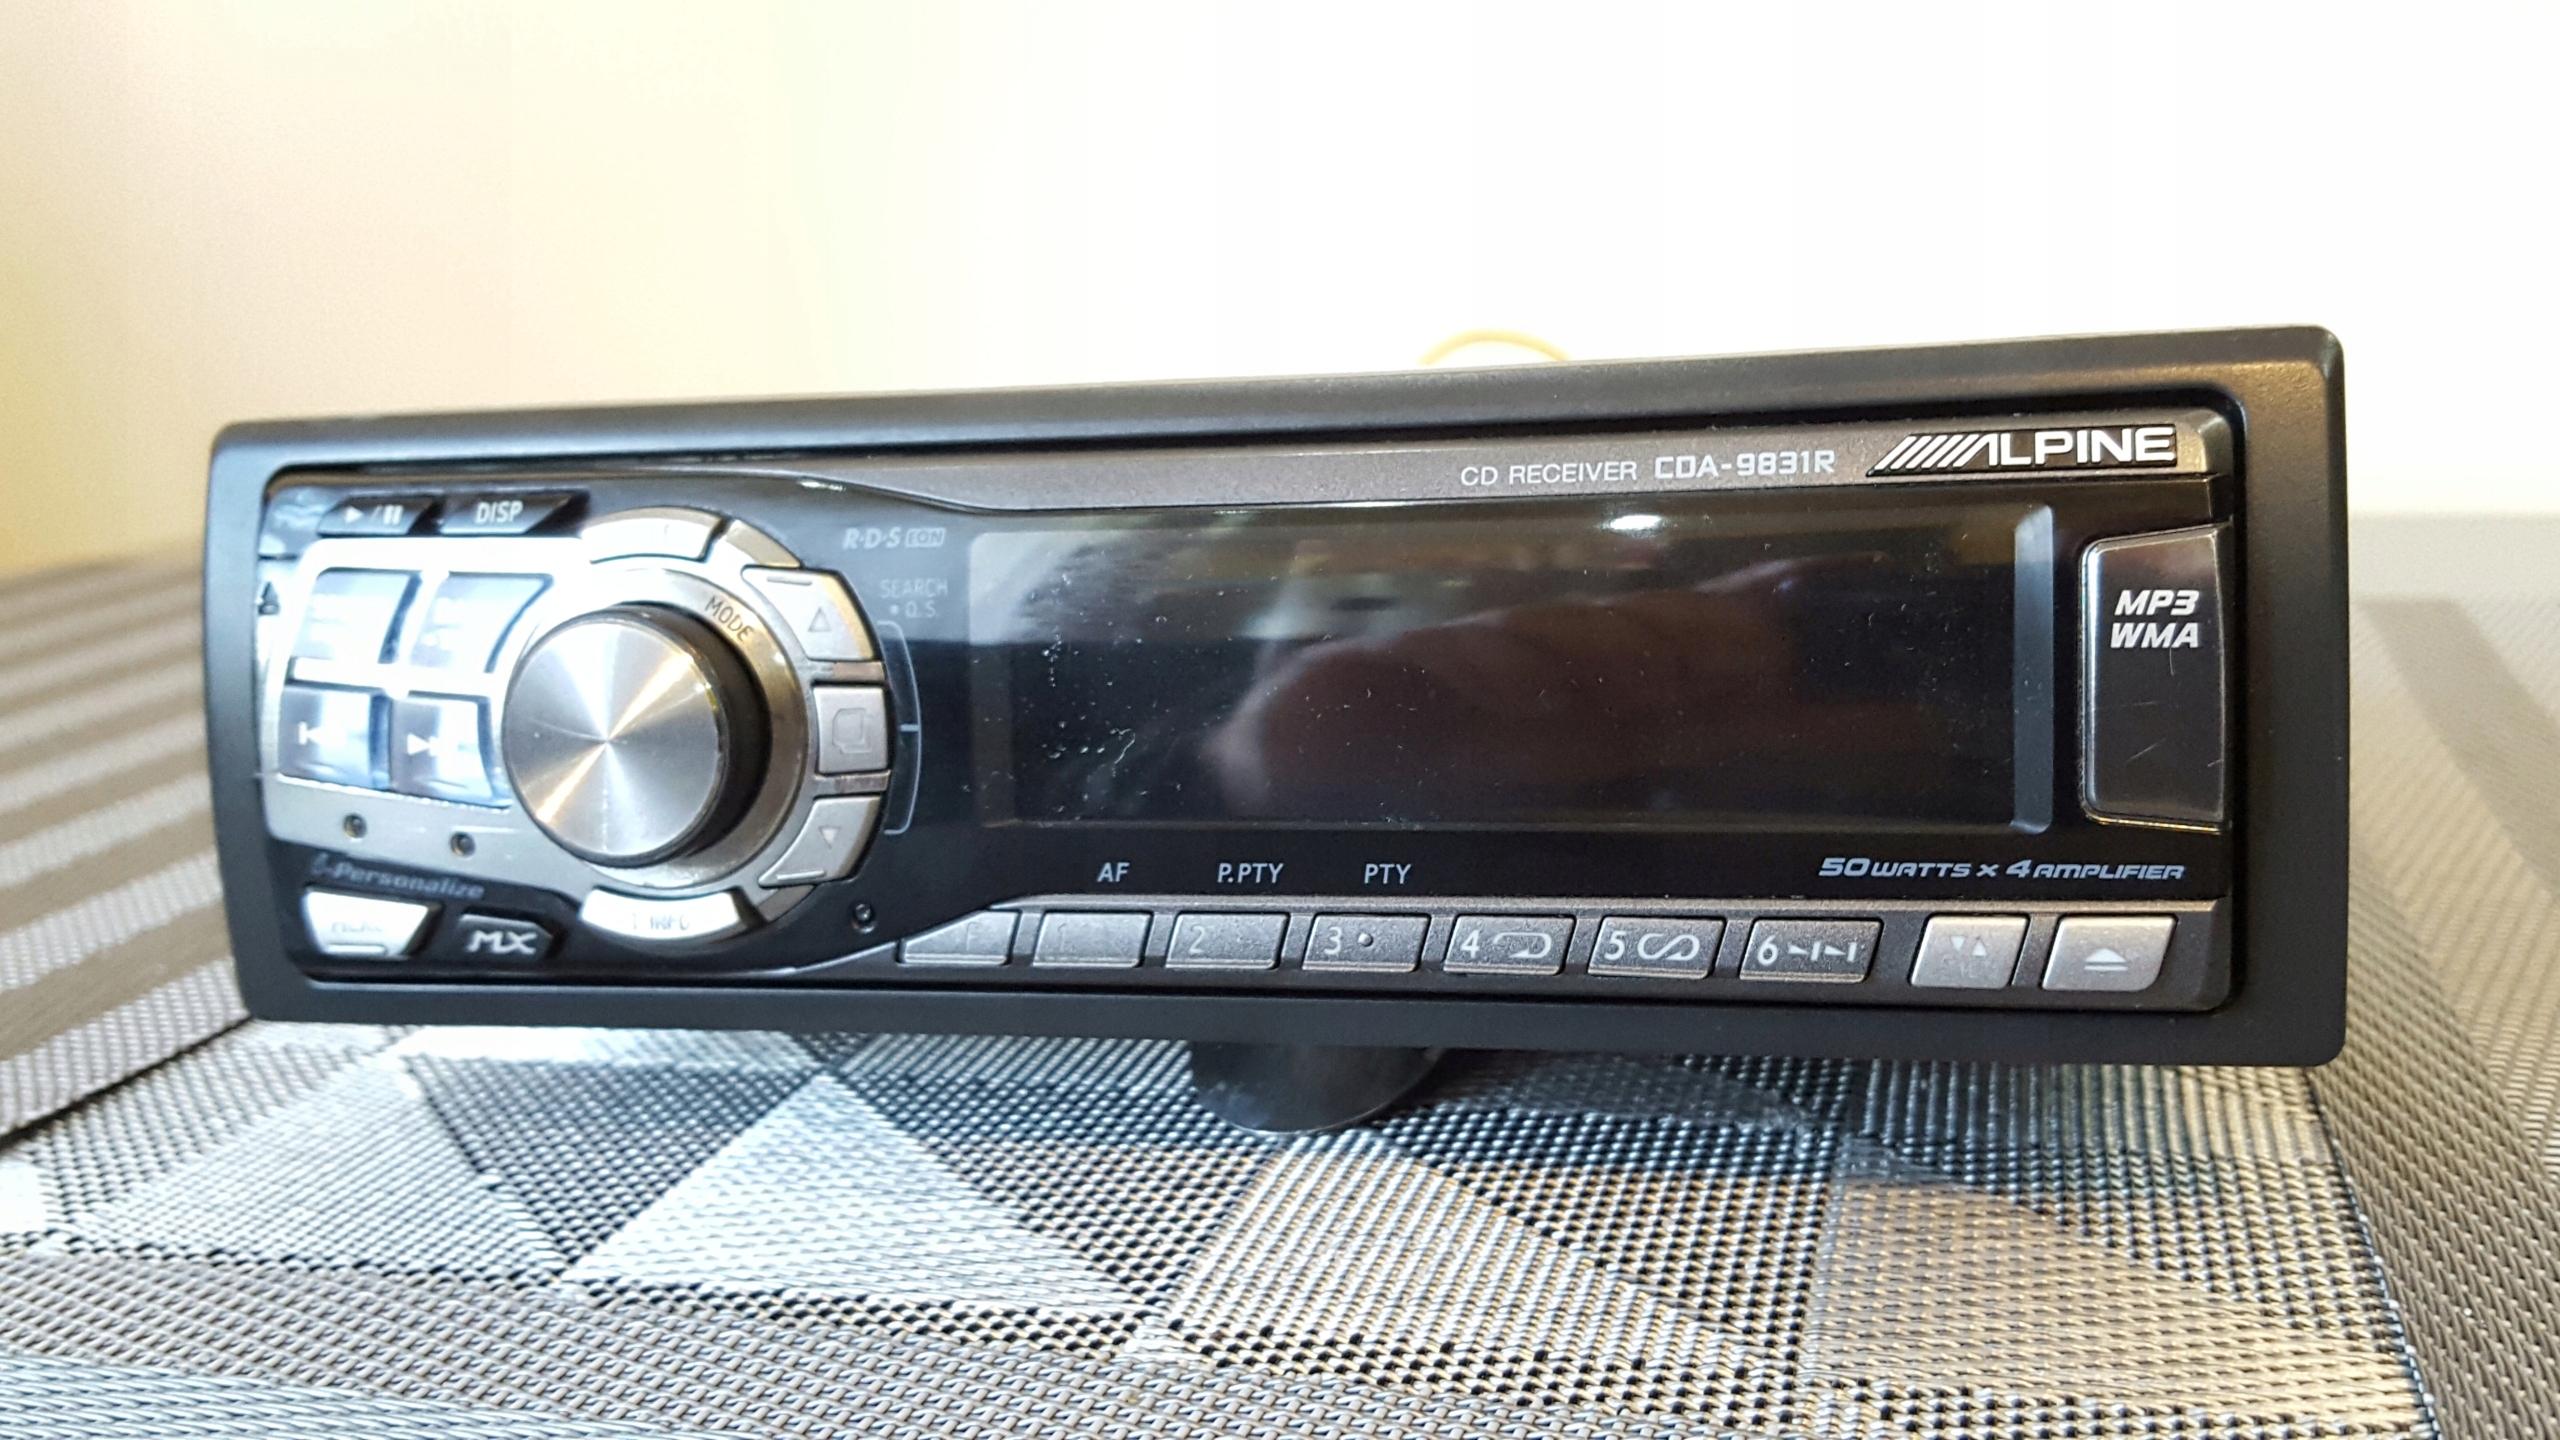 HI END CD MP3 Alpine CDA 9831R